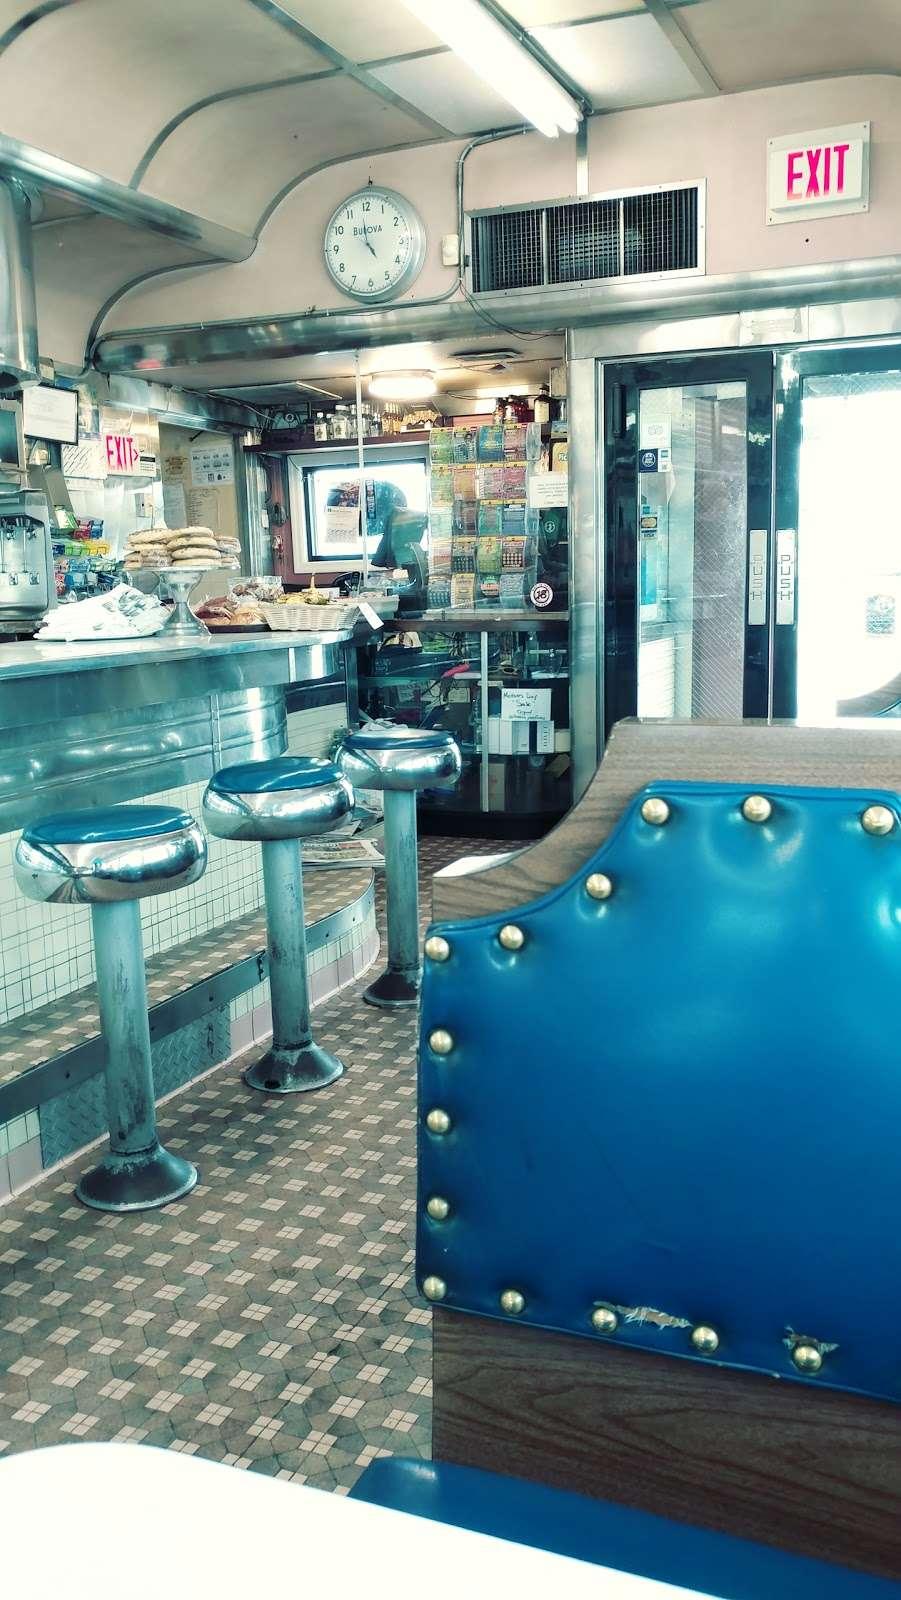 Truck Stop Diner - restaurant  | Photo 3 of 10 | Address: 1 Hackensack Ave, Kearny, NJ 07032, USA | Phone: (973) 344-4098